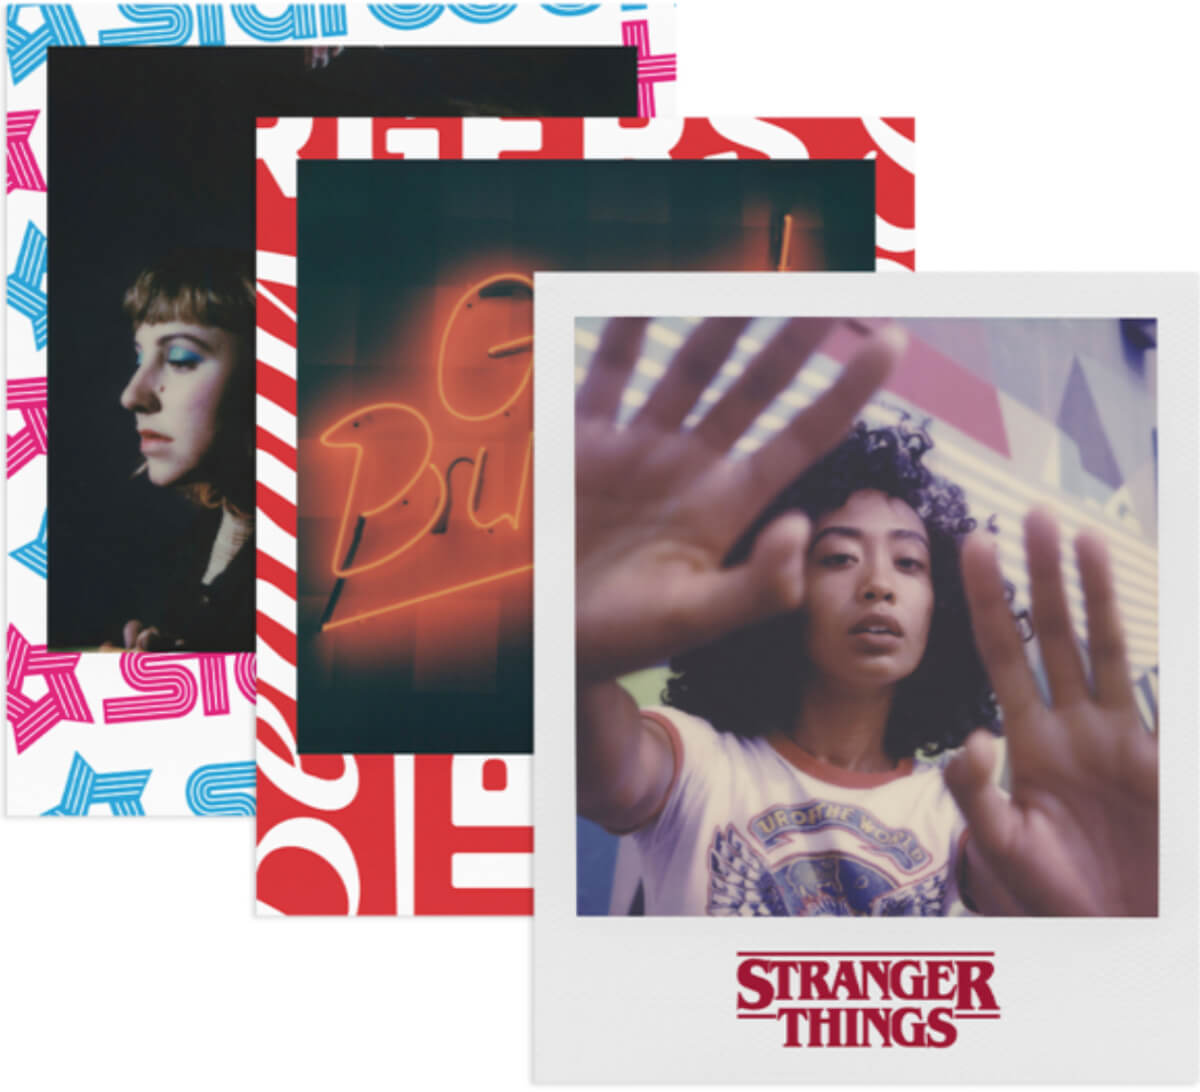 Netflix『ストレンジャー・シングス』のポラロイドカメラがかわいい!Polaroid Originalsとのコラボアイテムが発売 life190606_strangerthings_onestep_main